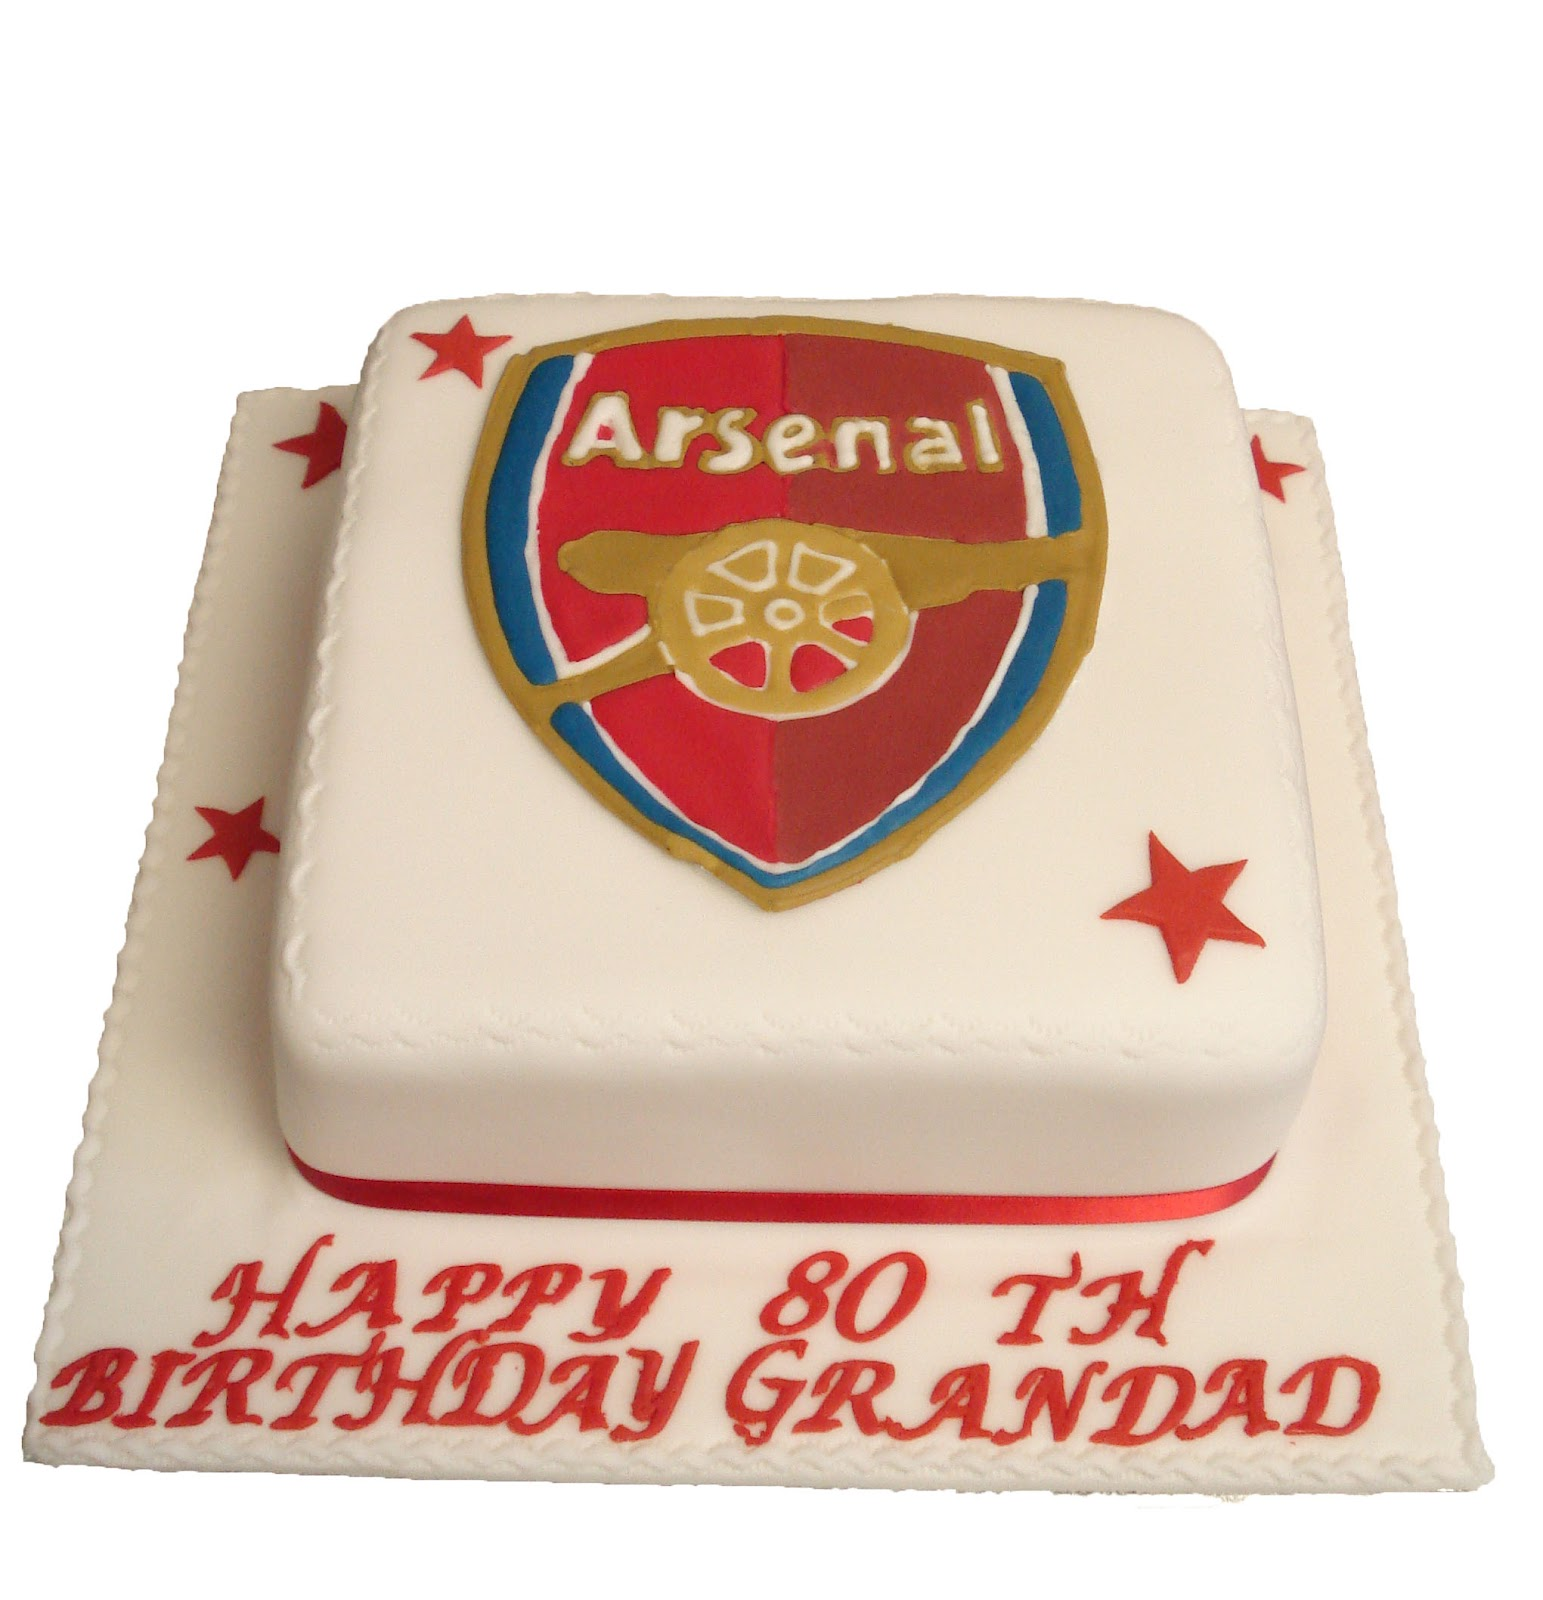 Brigitta s Cakes: Arsenal Cake